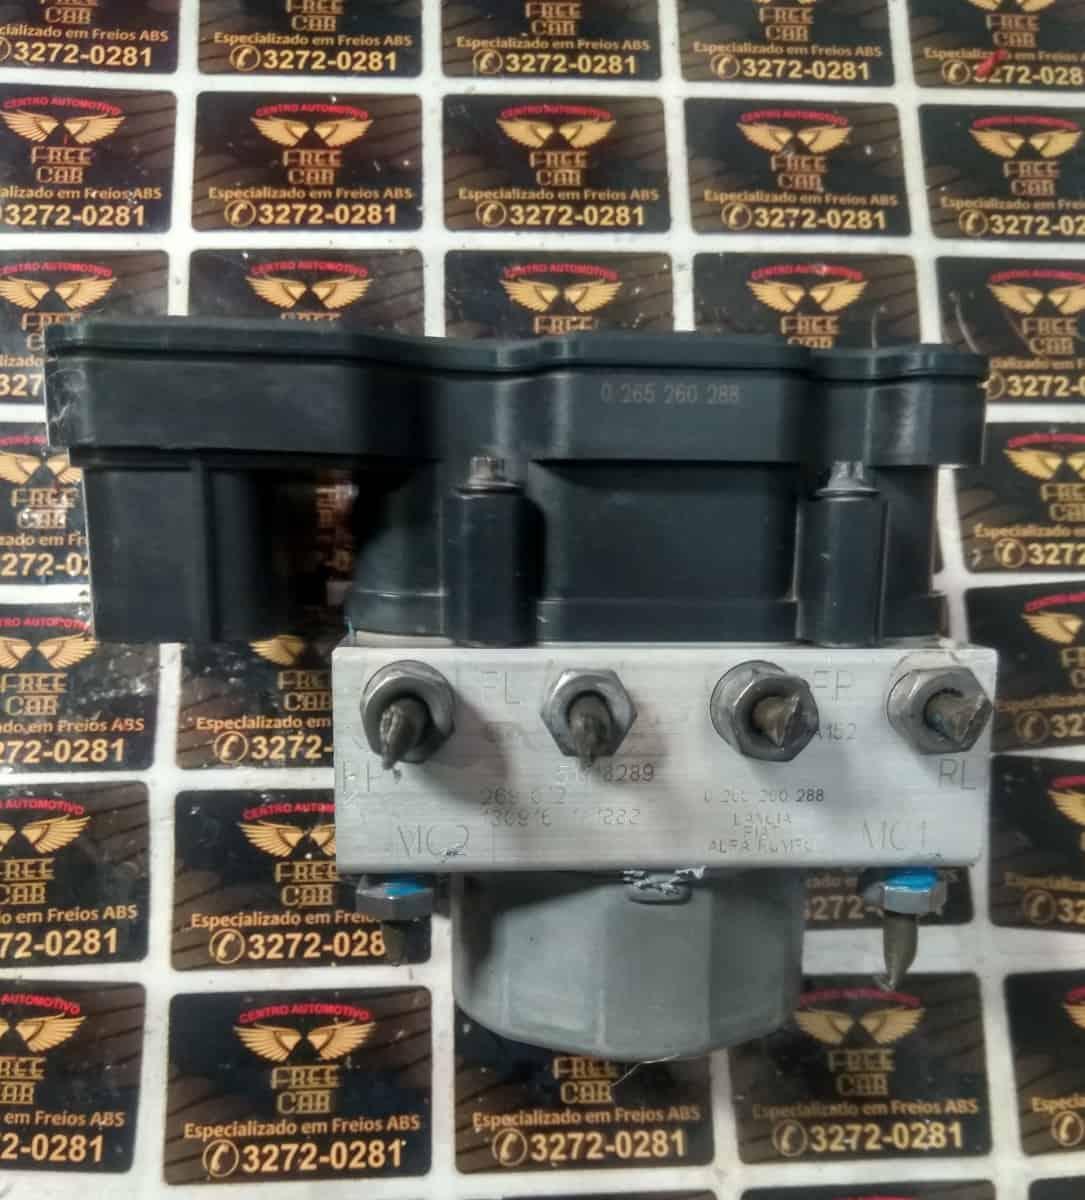 Modulo ABS Fiat 0 265 260 288 / 51918289 - Foto 1